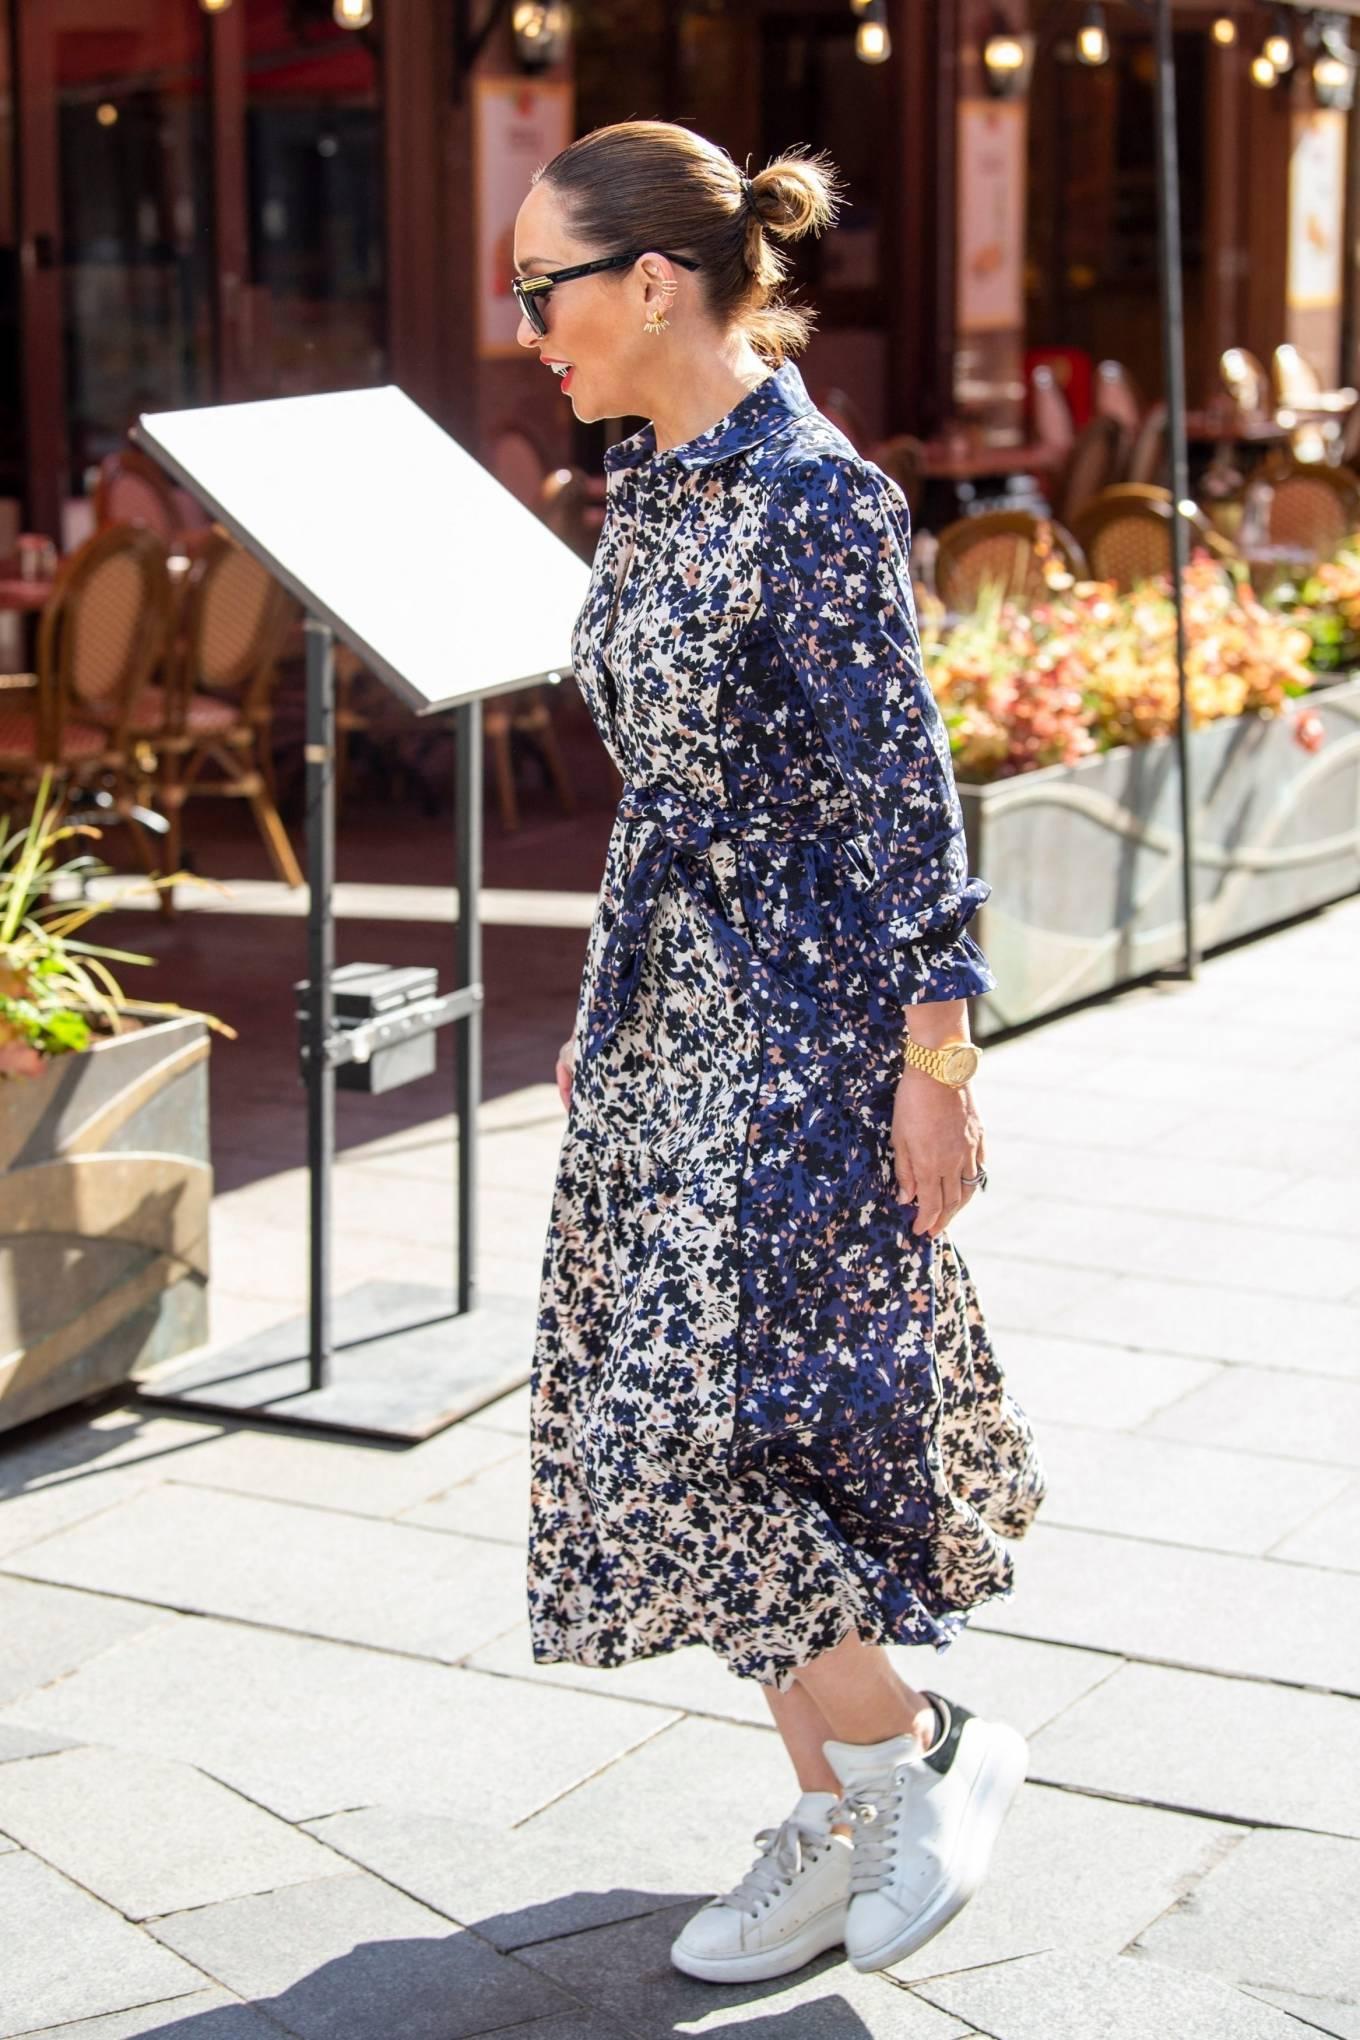 Myleene Klass 2021 : Myleene Klass – In a long summer dress arriving at the Global studios -16